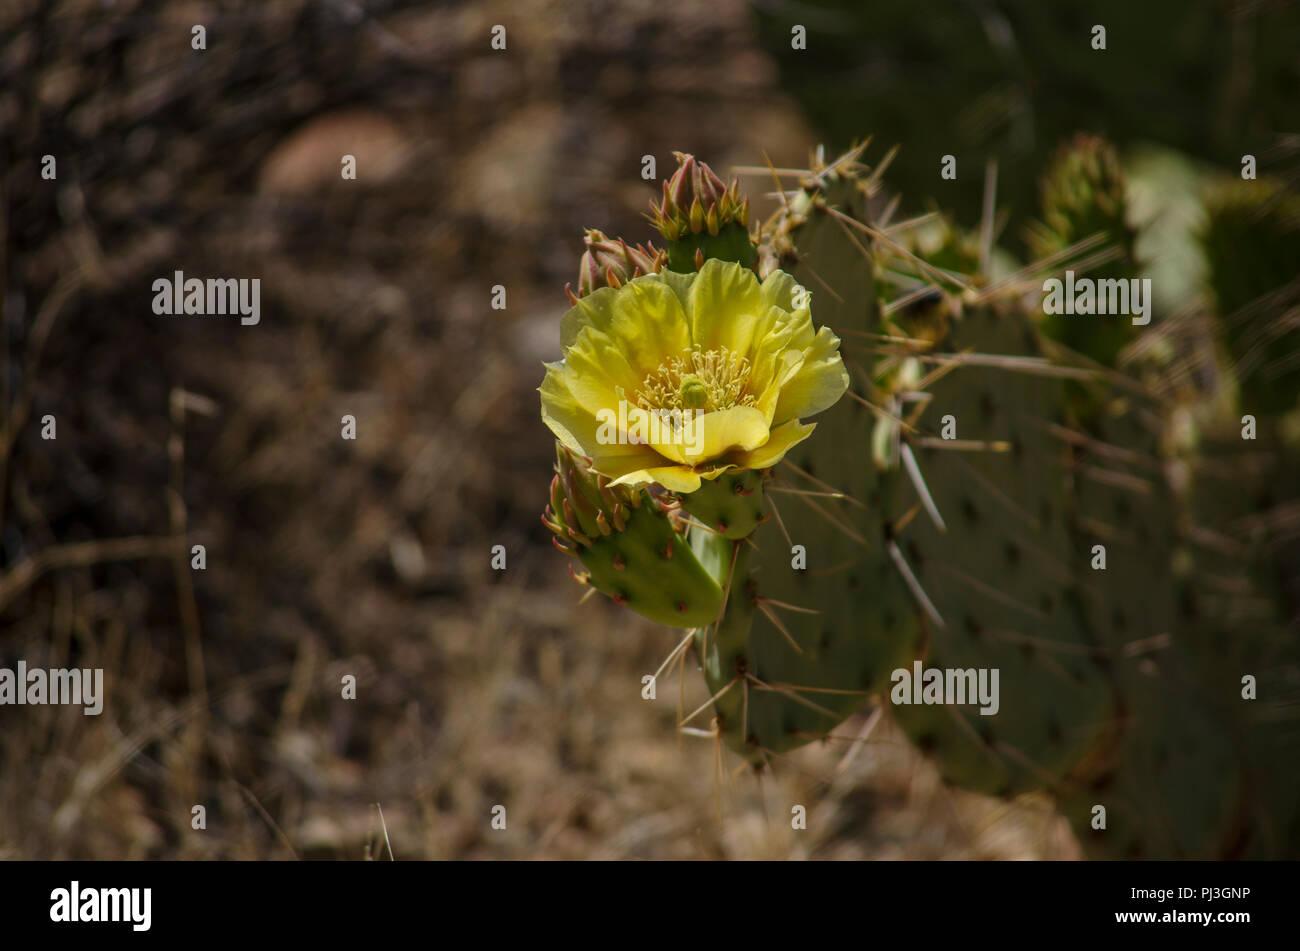 Cactus With Yellow Flower Stock Photo 217667234 Alamy